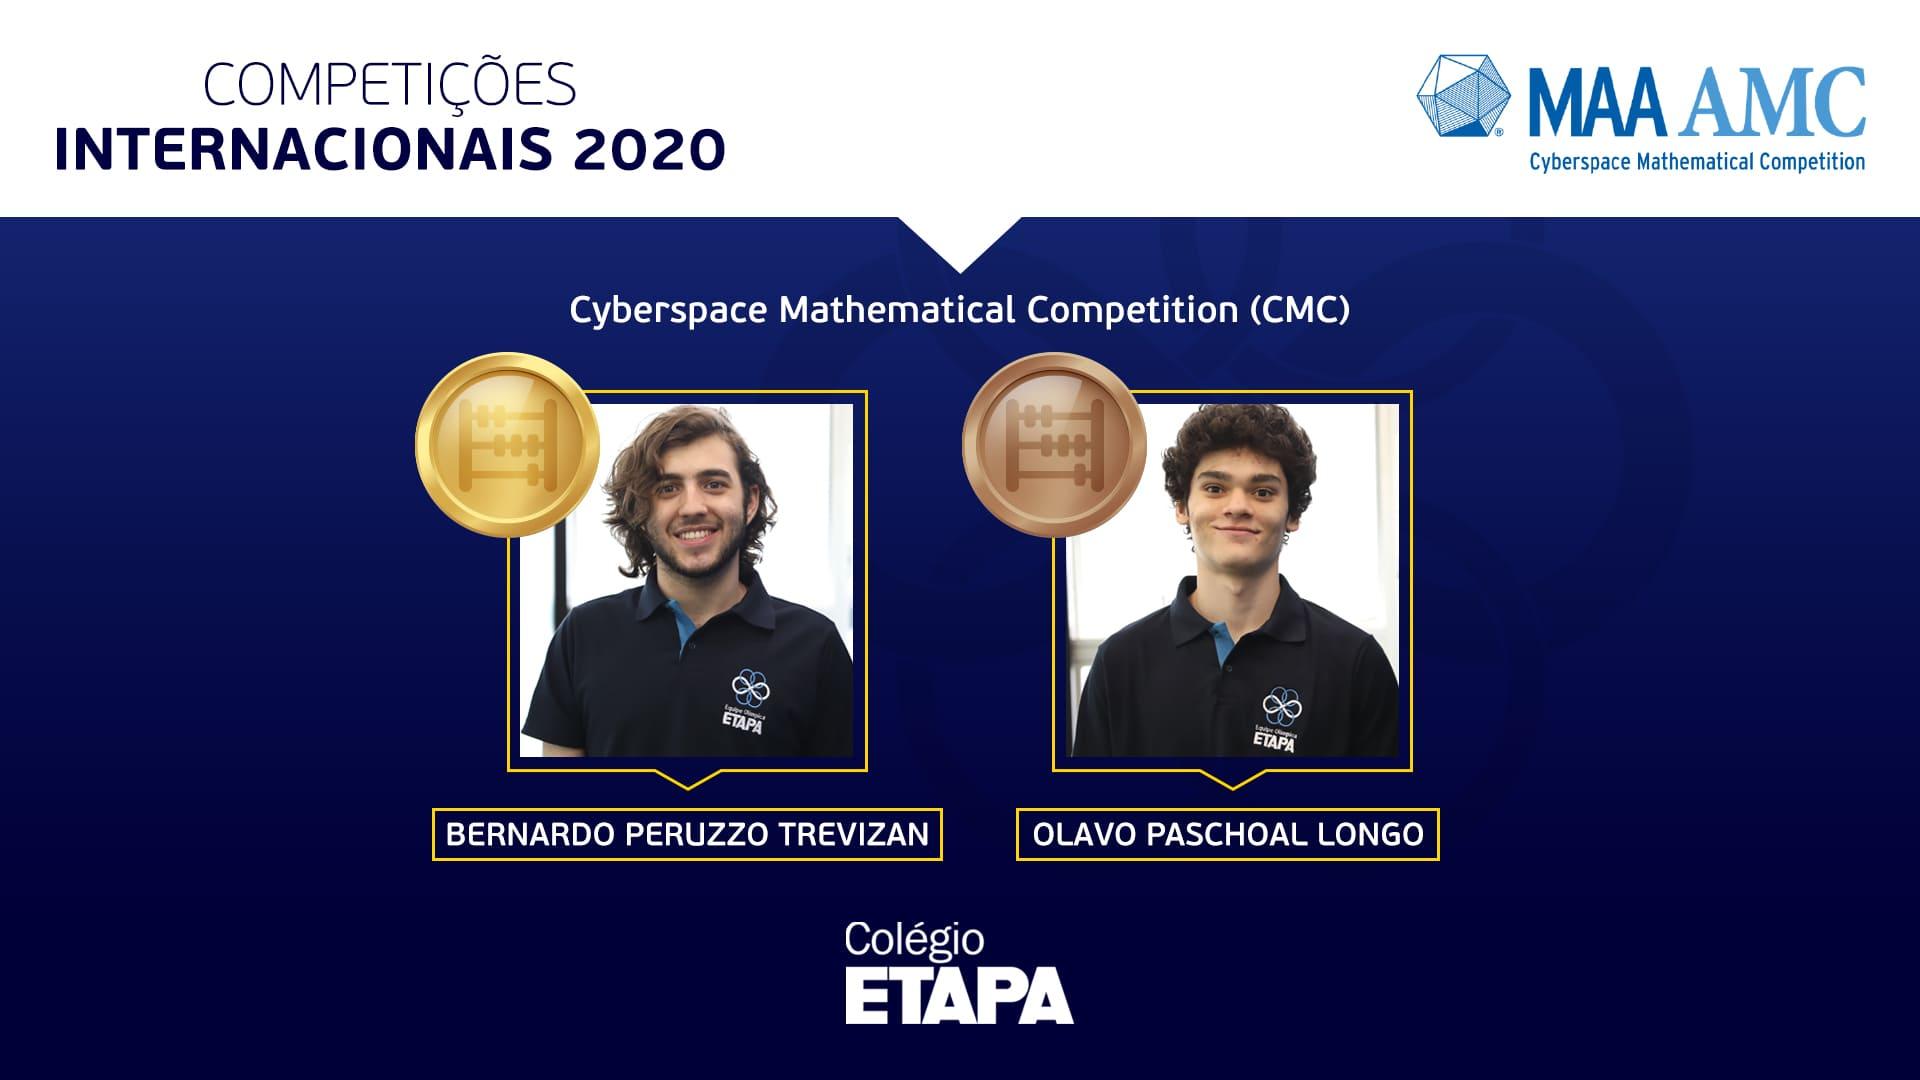 Bernardo Peruzzo Trevizan alcançou a maior nota entre os competidores brasileiros na Cyberspace Mathematical Competition.